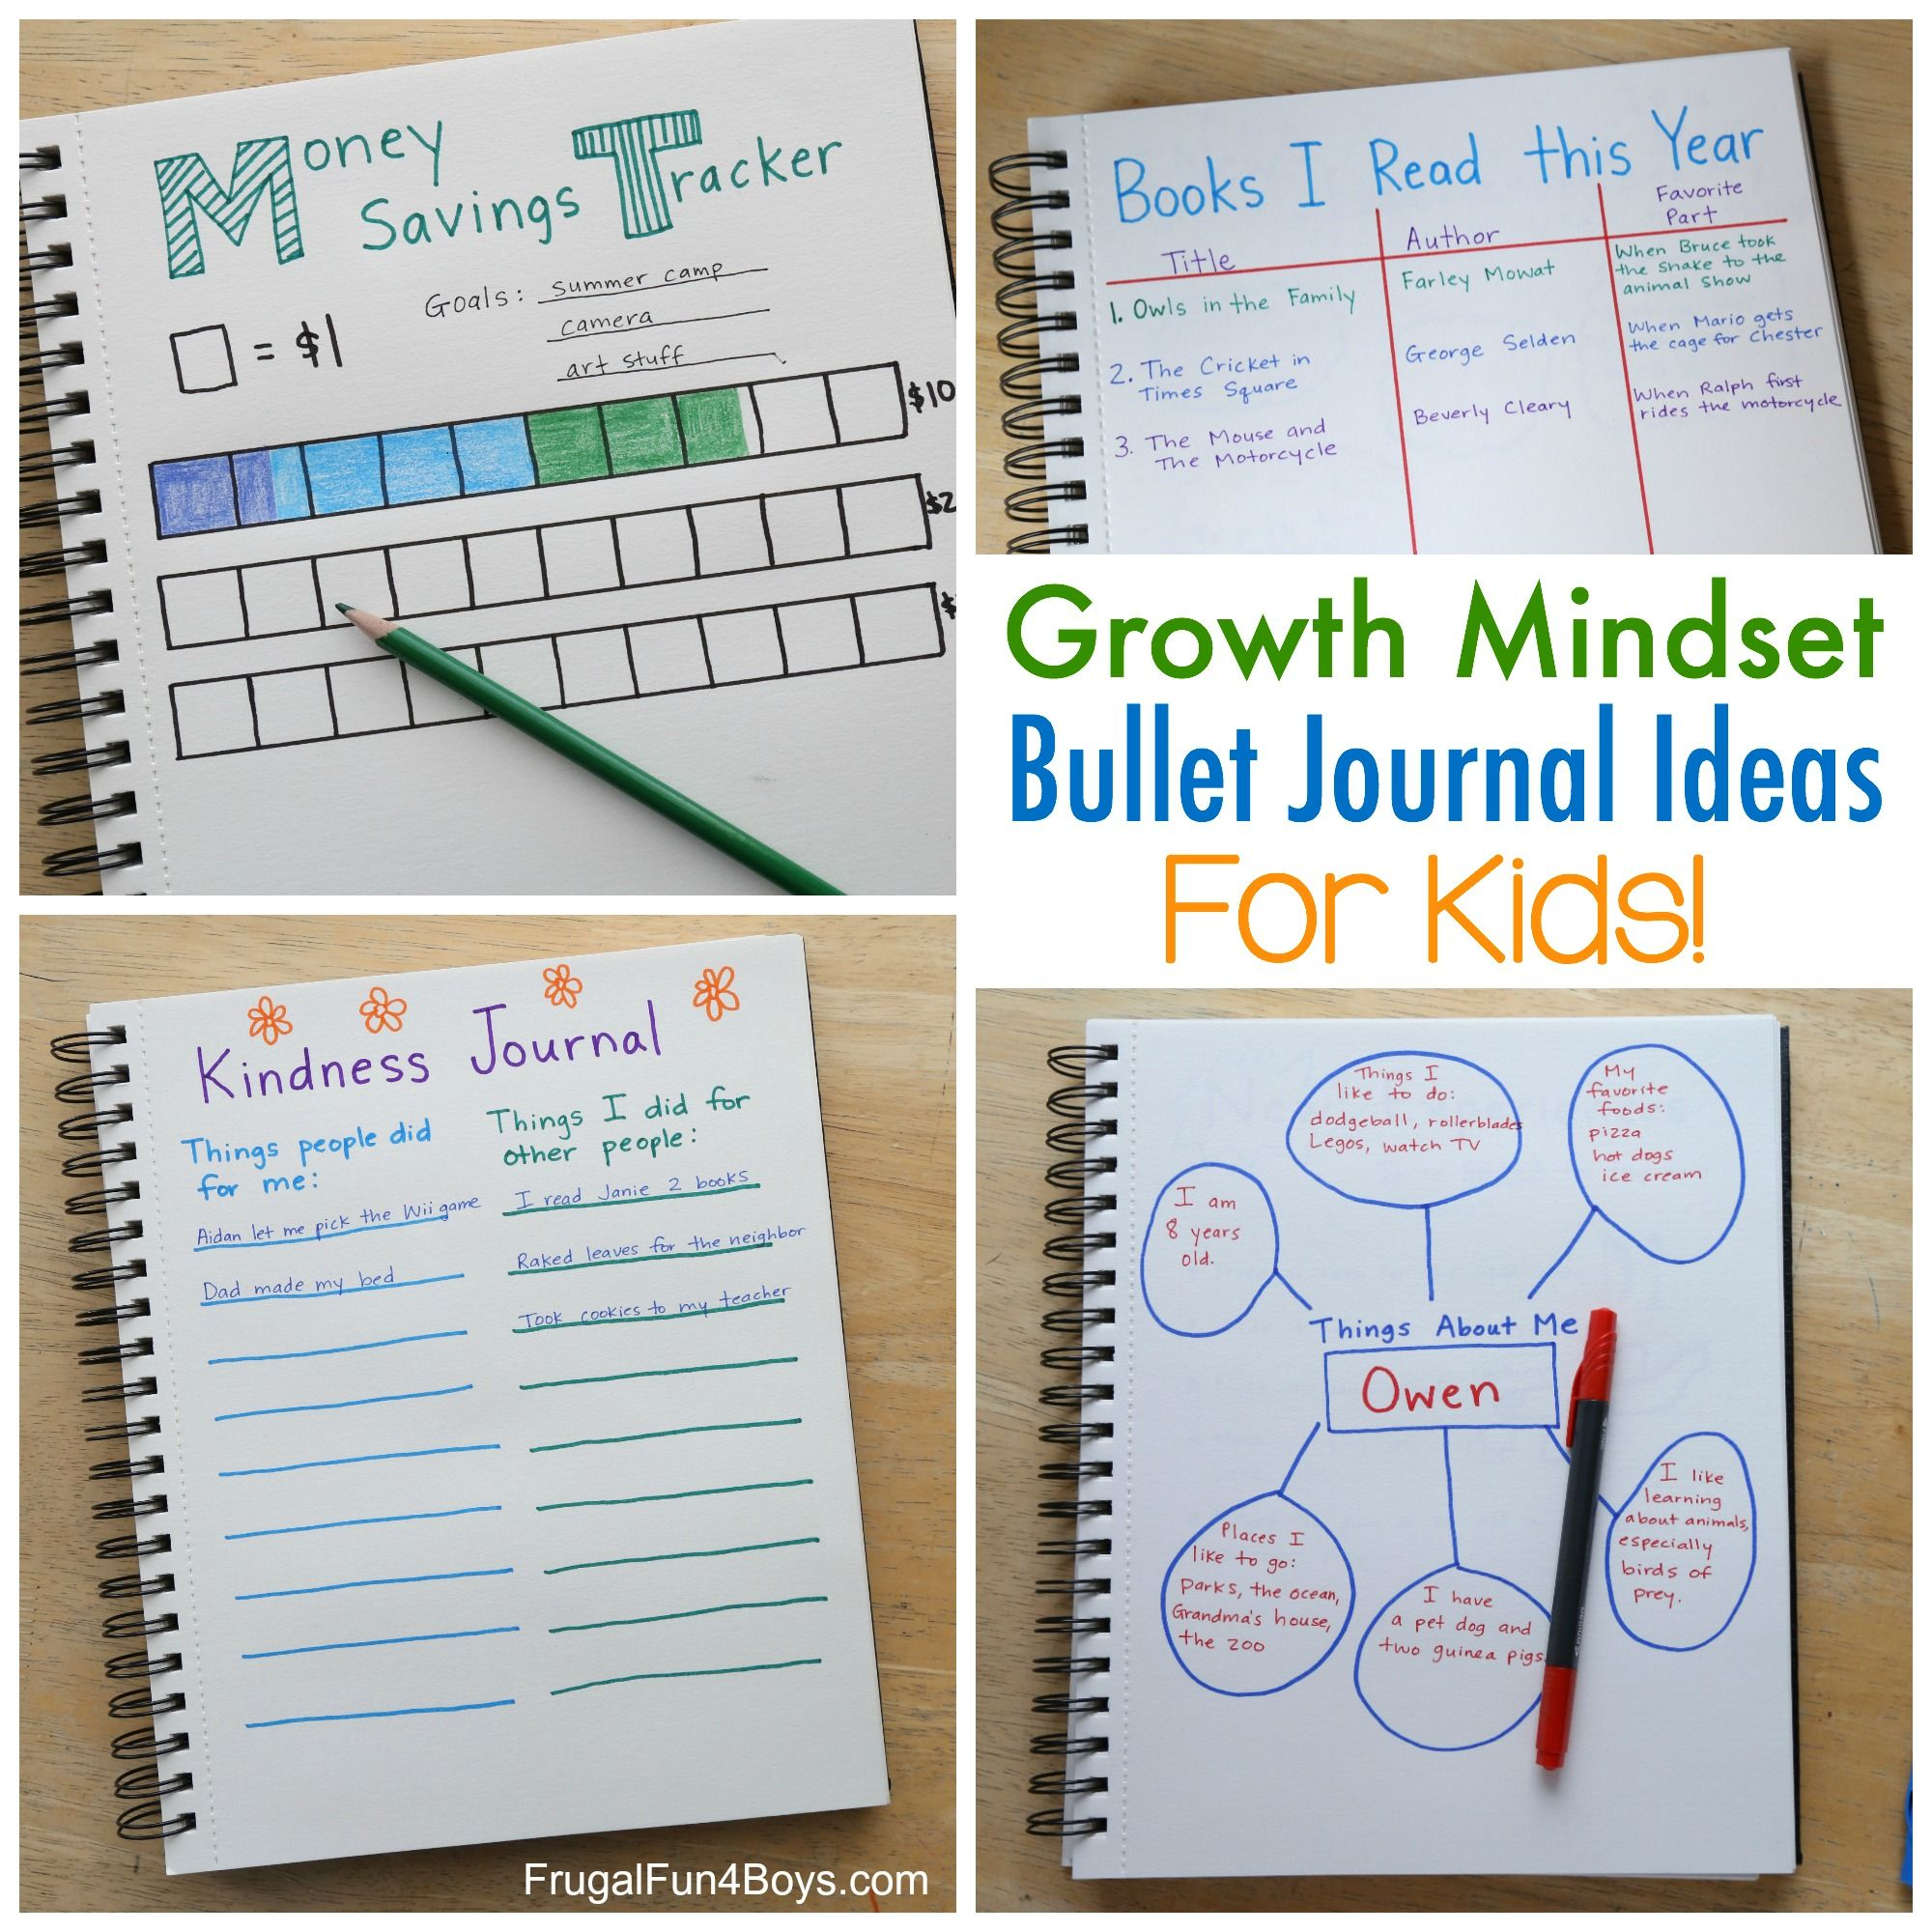 Growth Mindset Bullet Journal Ideas For Kids